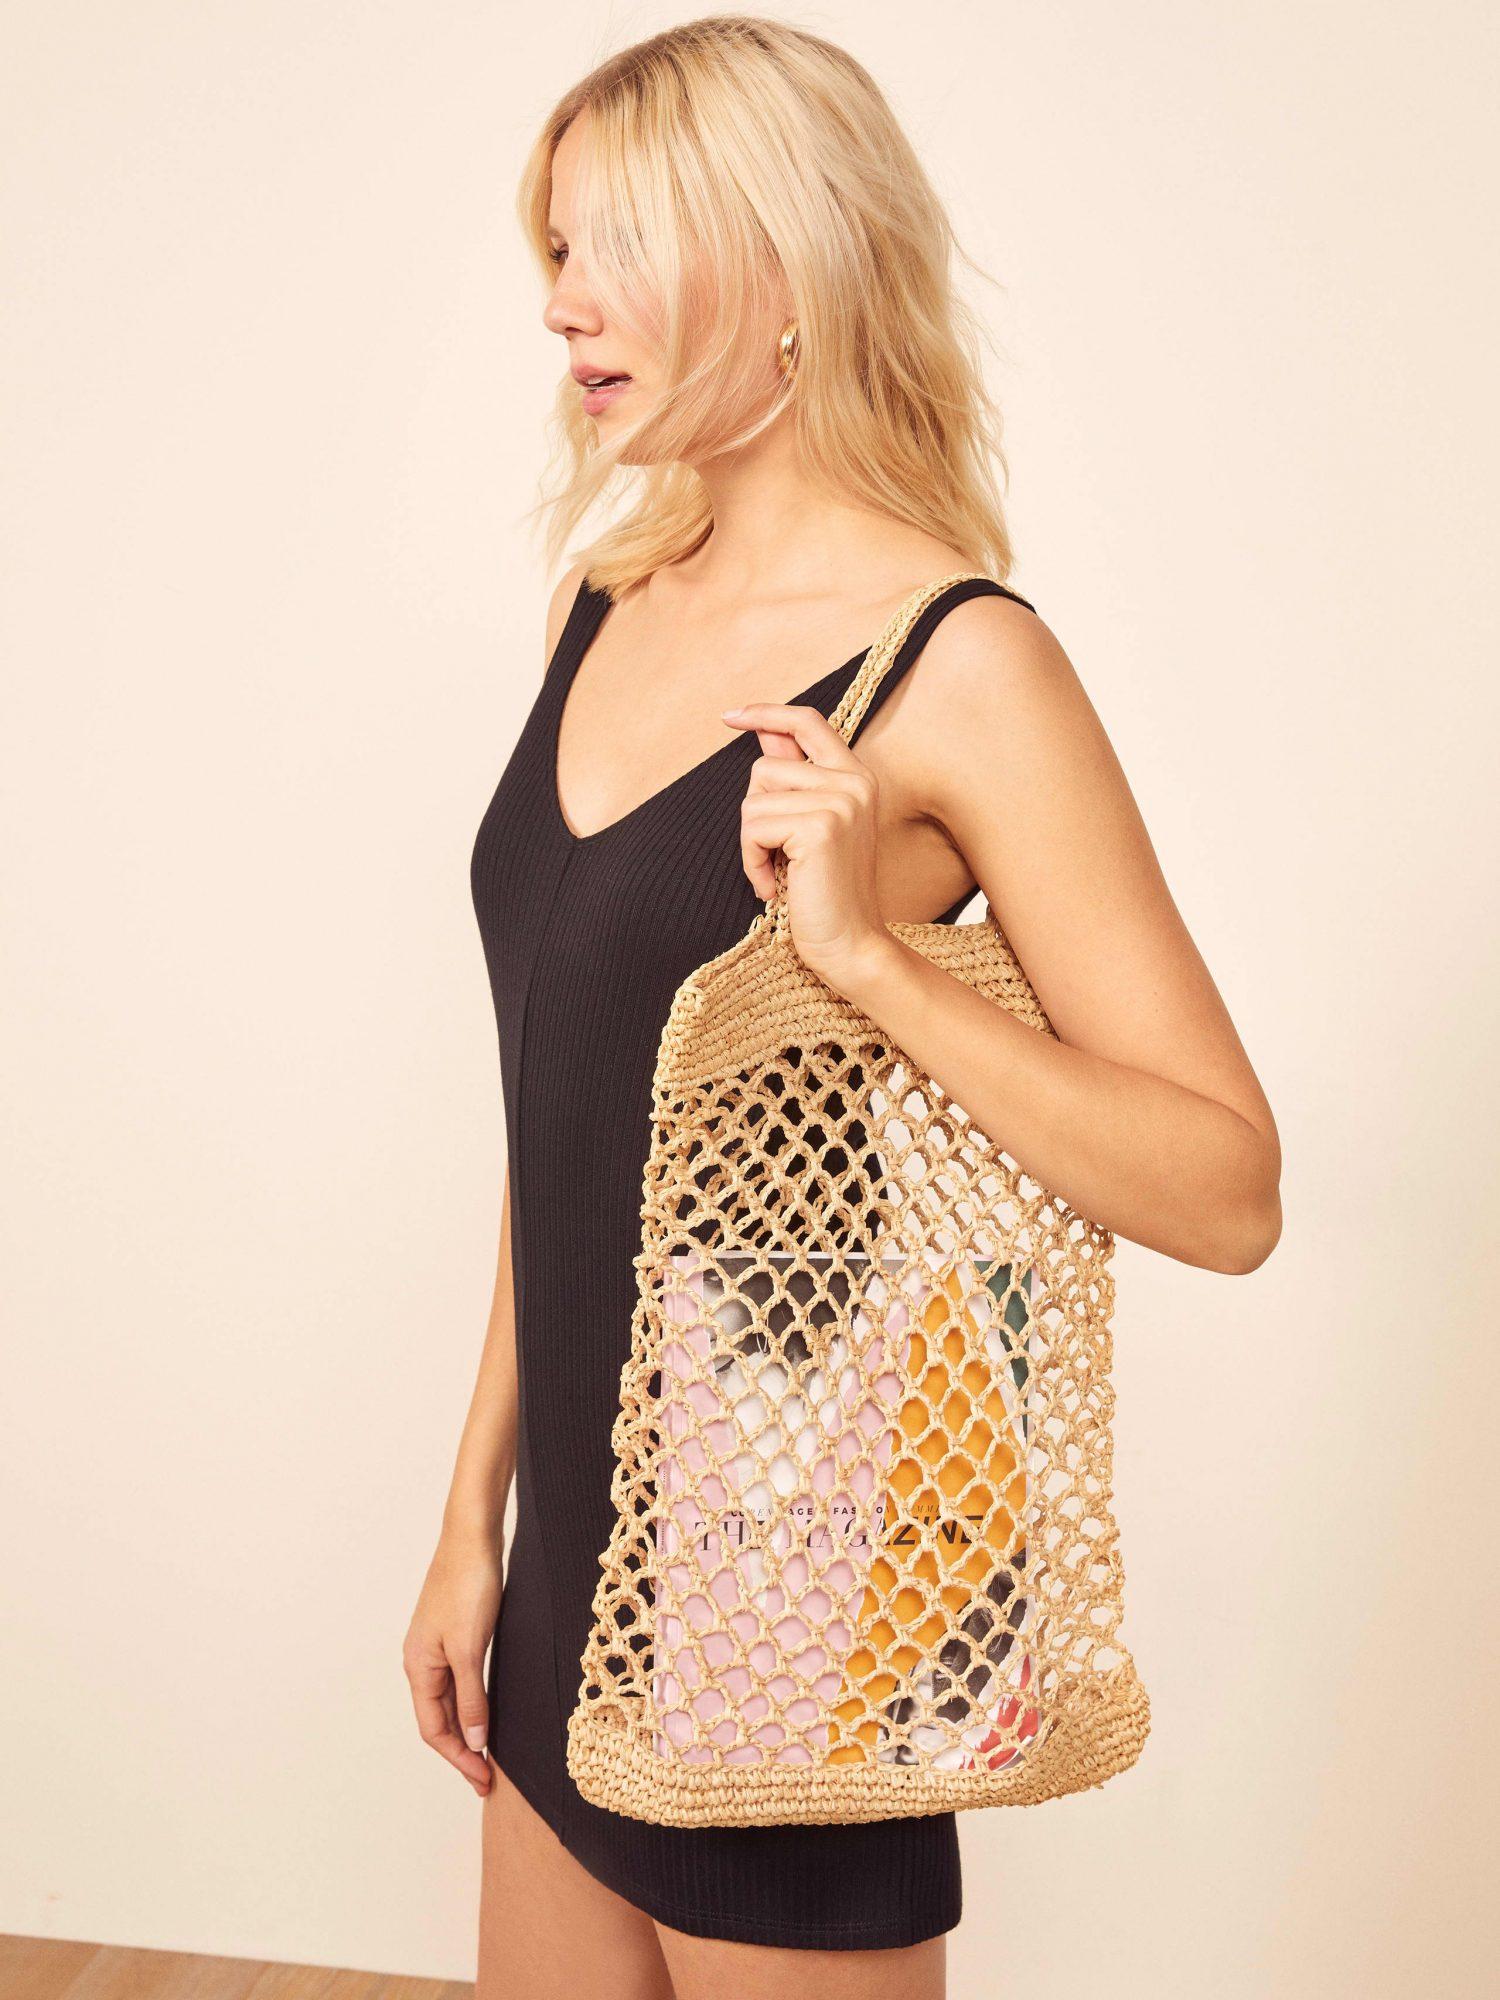 Reformation Straw Everyday Market Bag